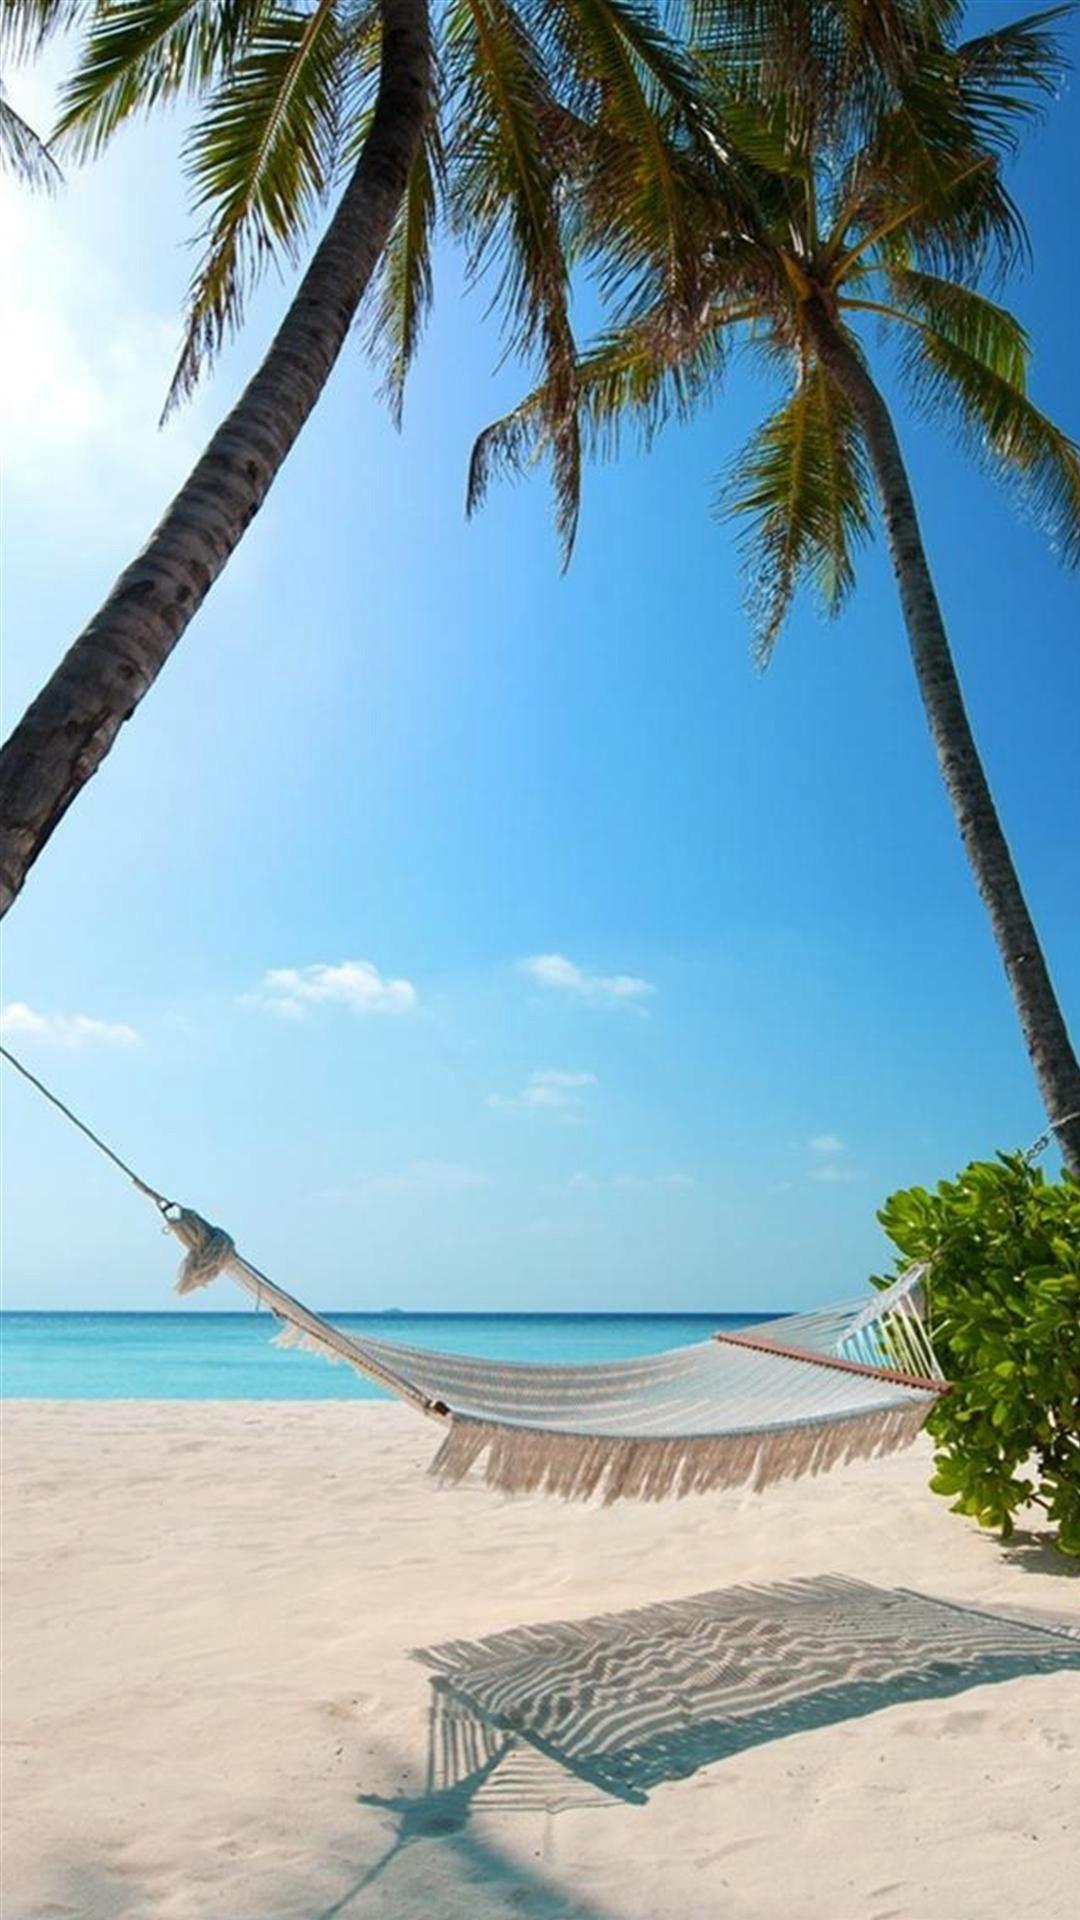 Hammock Palm Trees Beach iPhone 6 Plus HD Wallpaper …